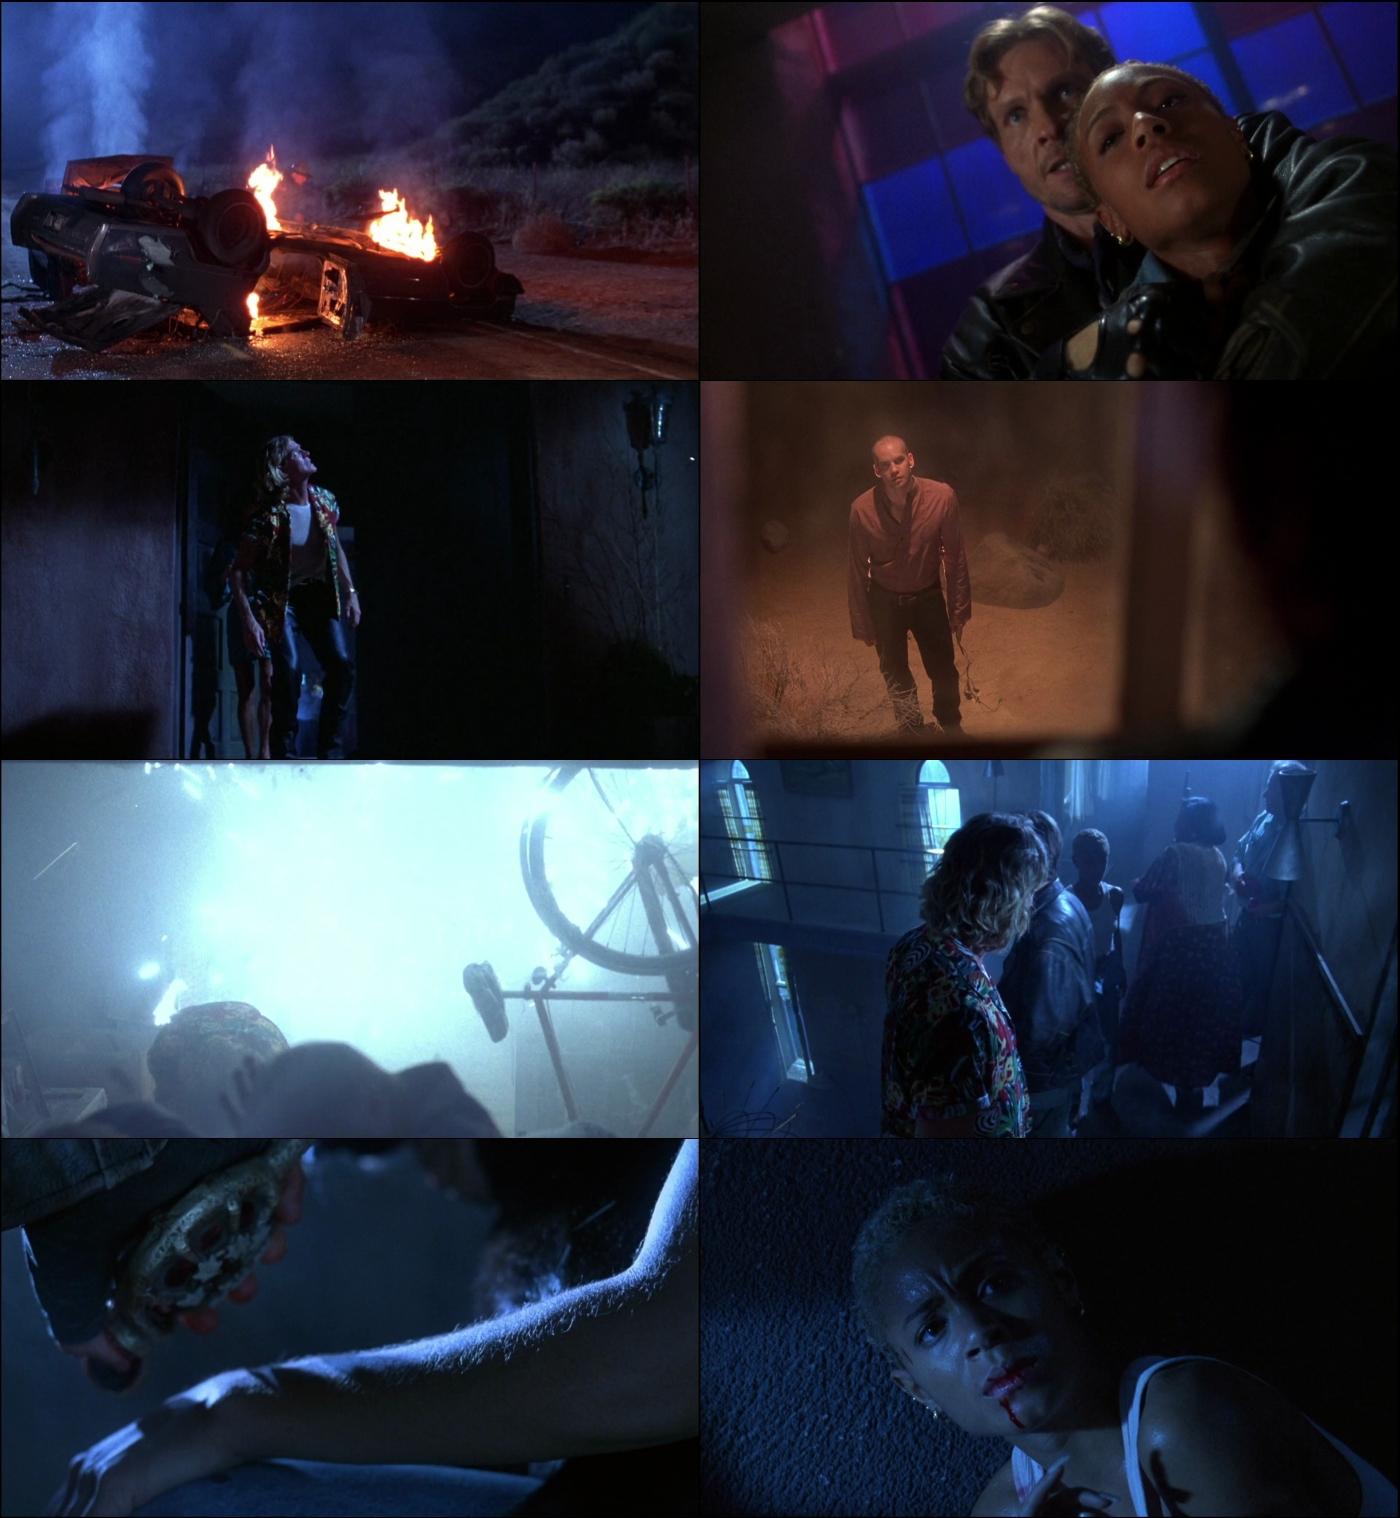 Historias de la cripta caballero del diablo 1080p Latino